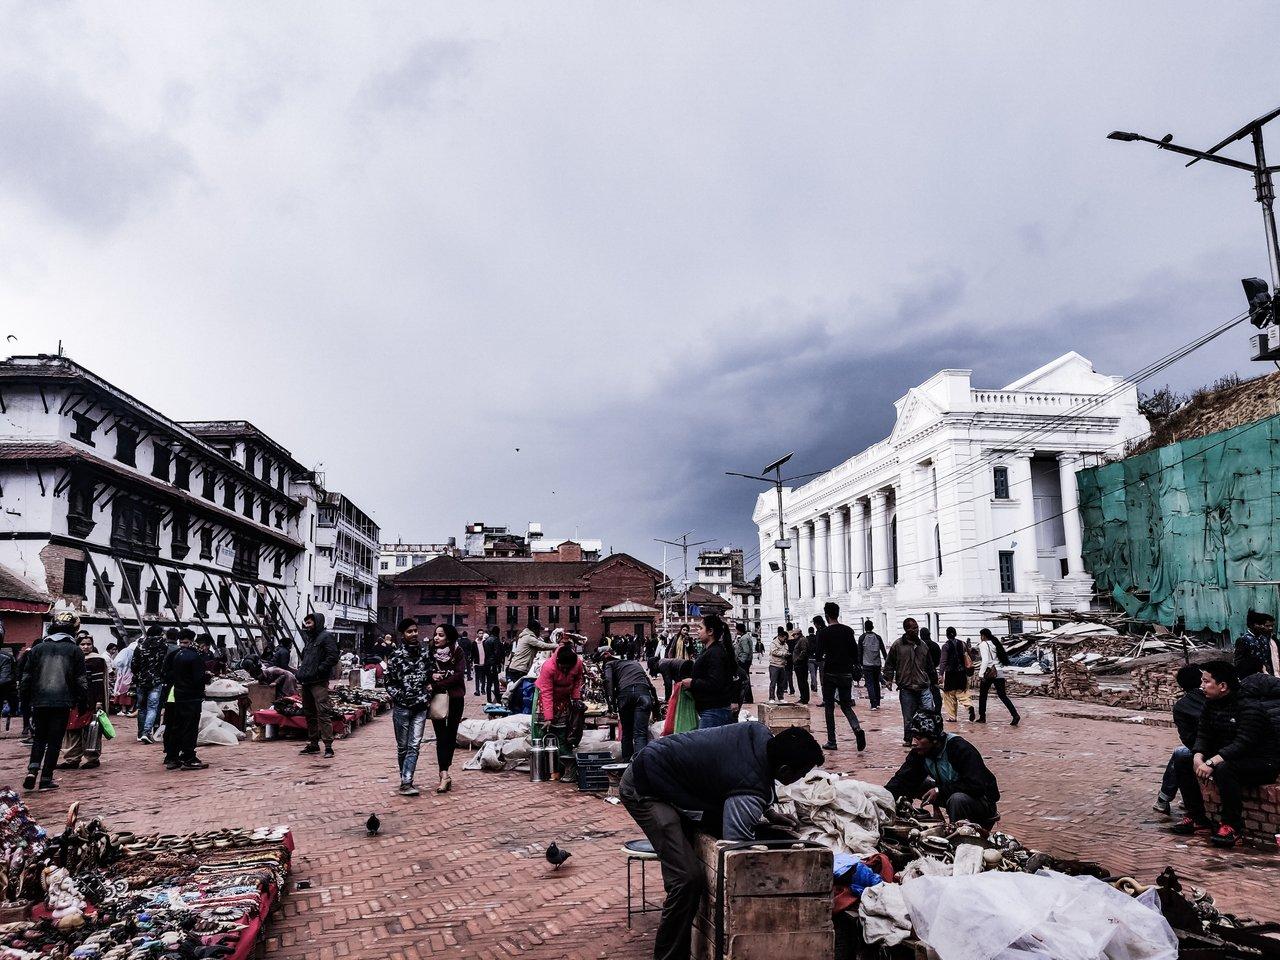 Historical Palace of medieval Malla King in Kathmandu